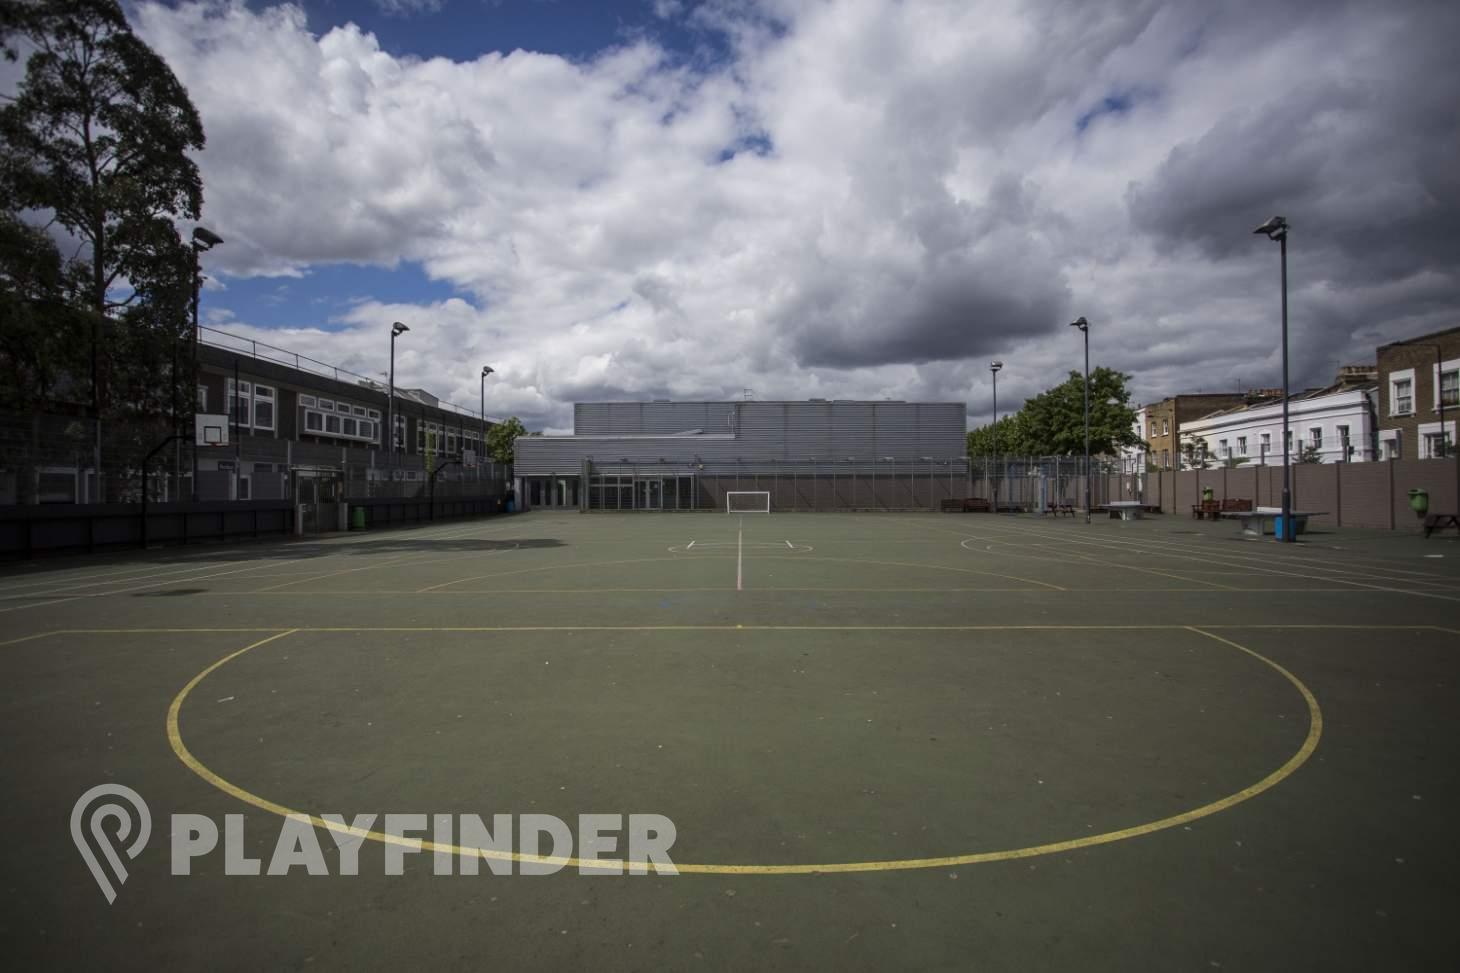 Acland Burghley School 5 a side | Concrete football pitch